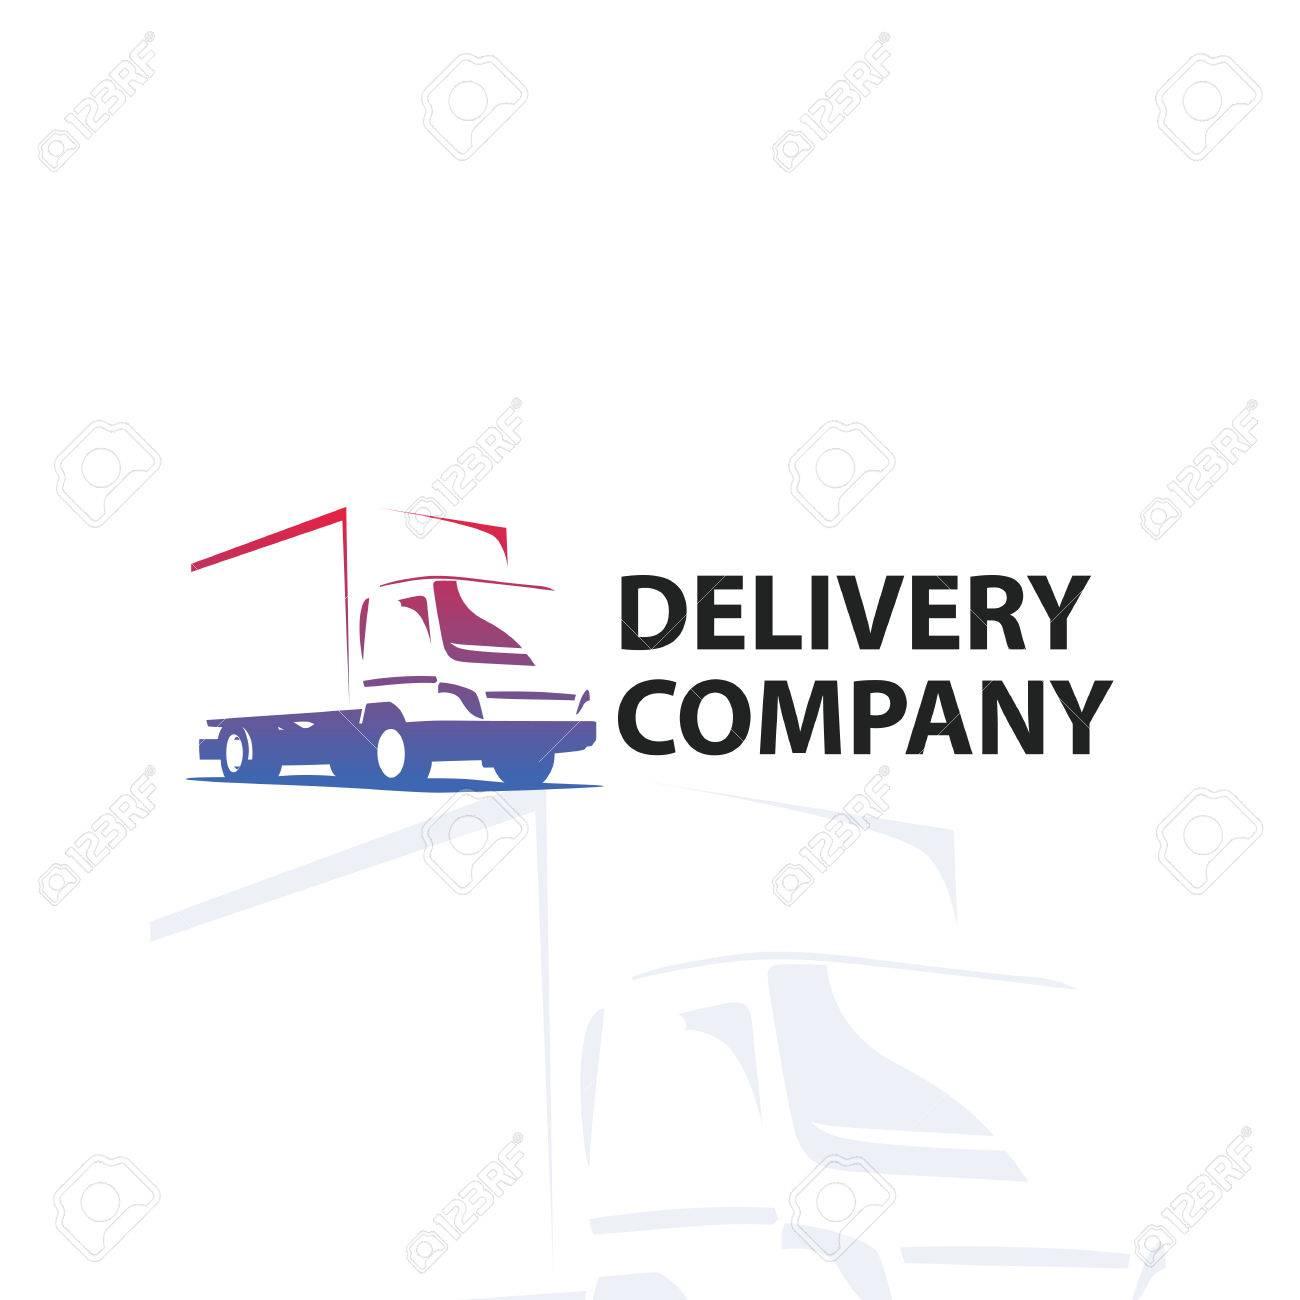 car repair or delivery service label vector logo design template